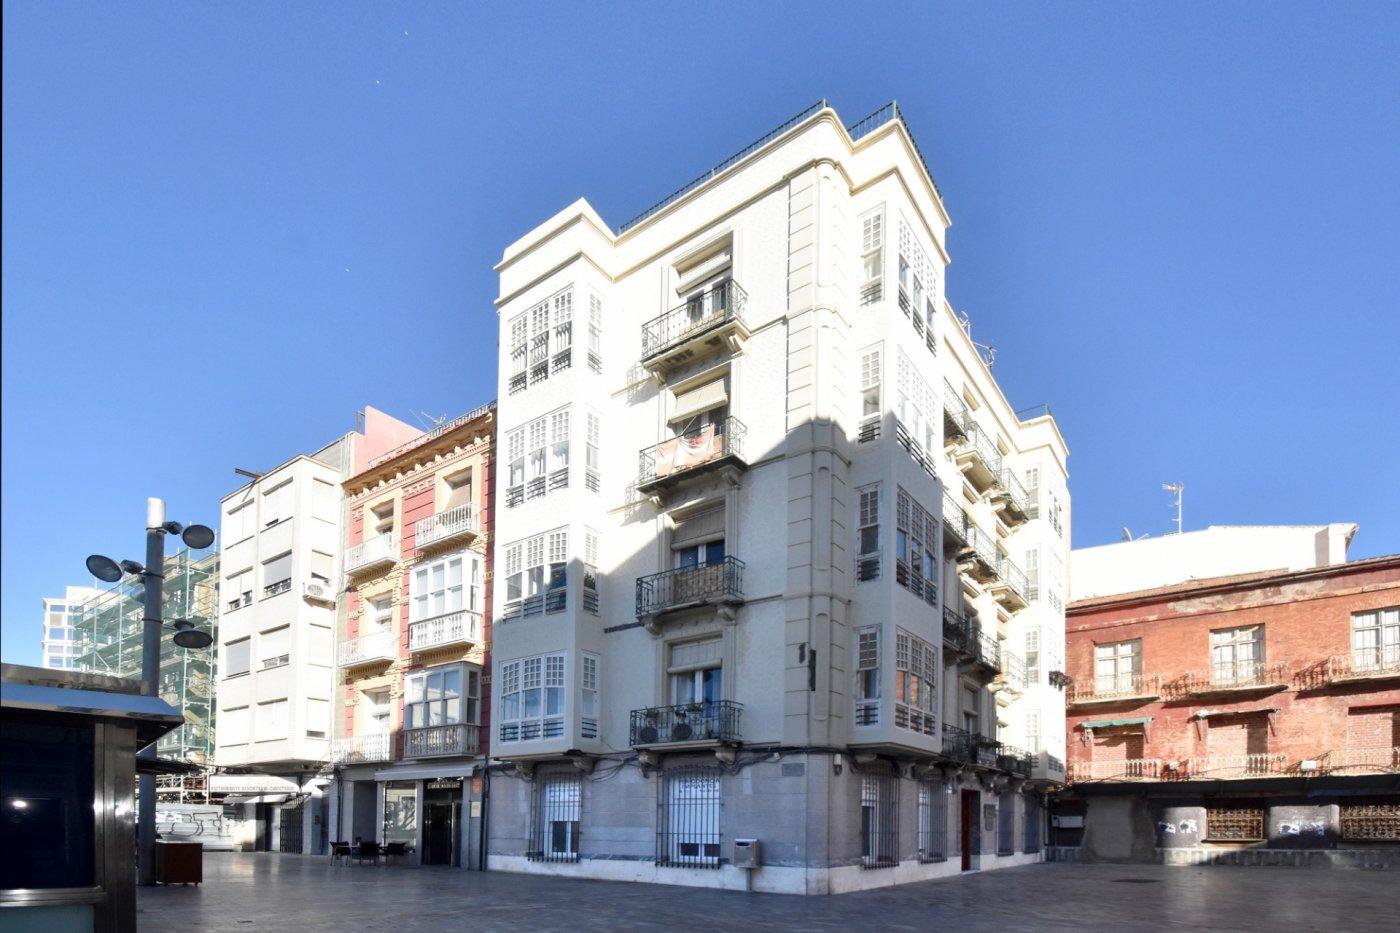 Local comercial entrar a vivir  en Cartagena